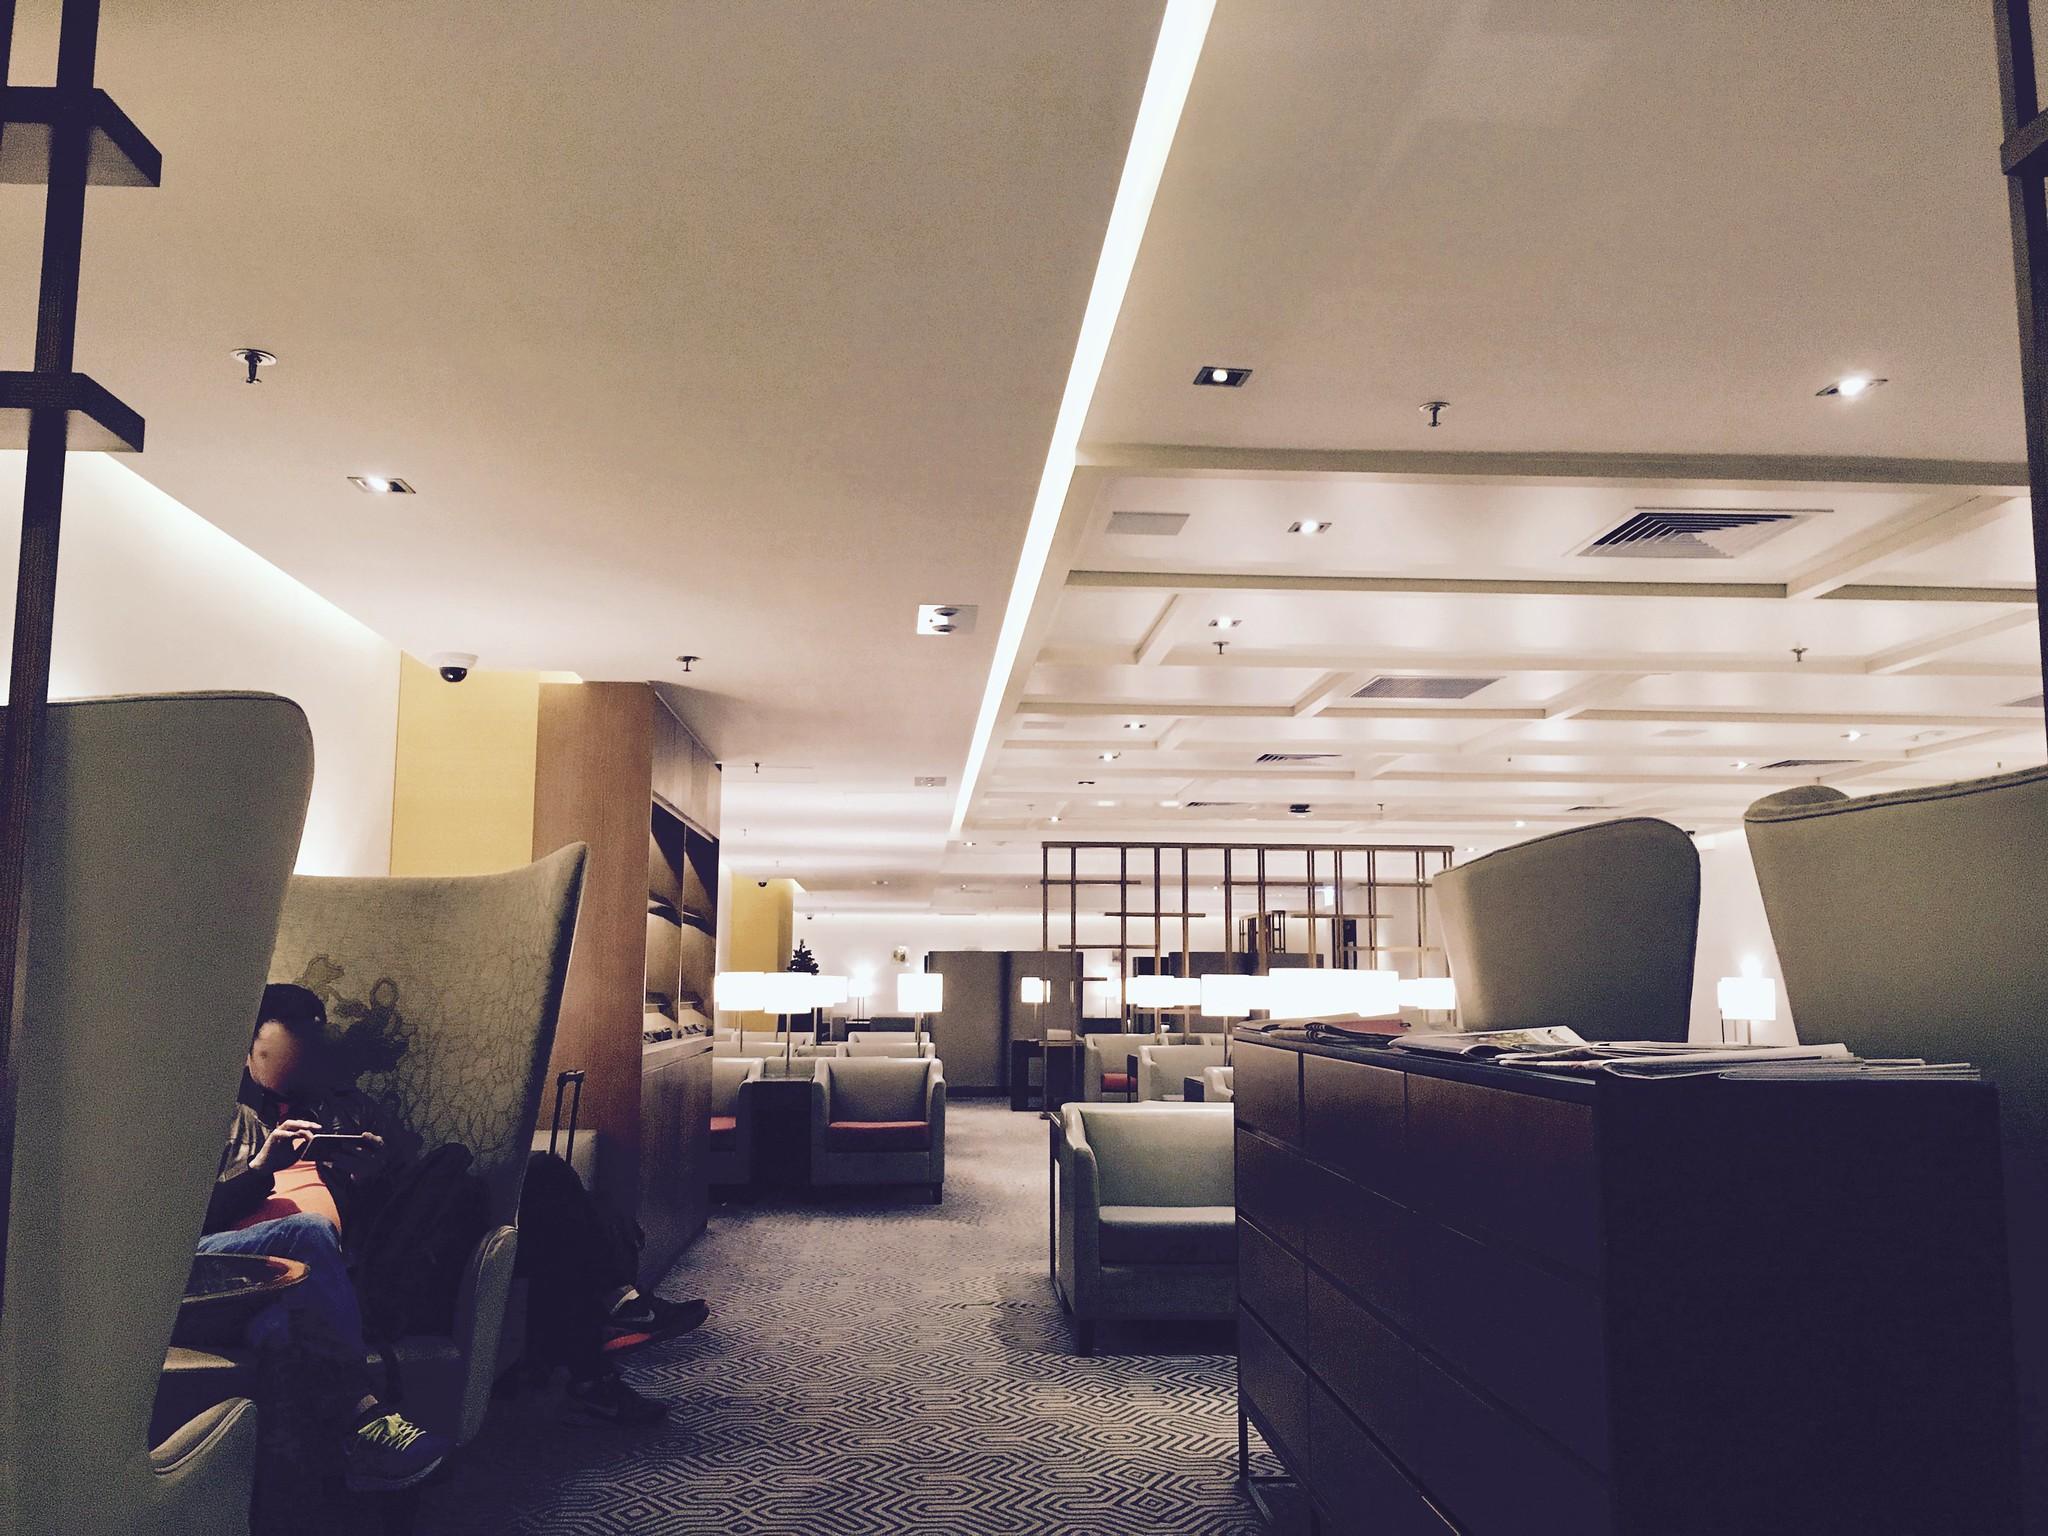 Hong Kong International Airport Singapore Airlines SilverKris Business Lounge